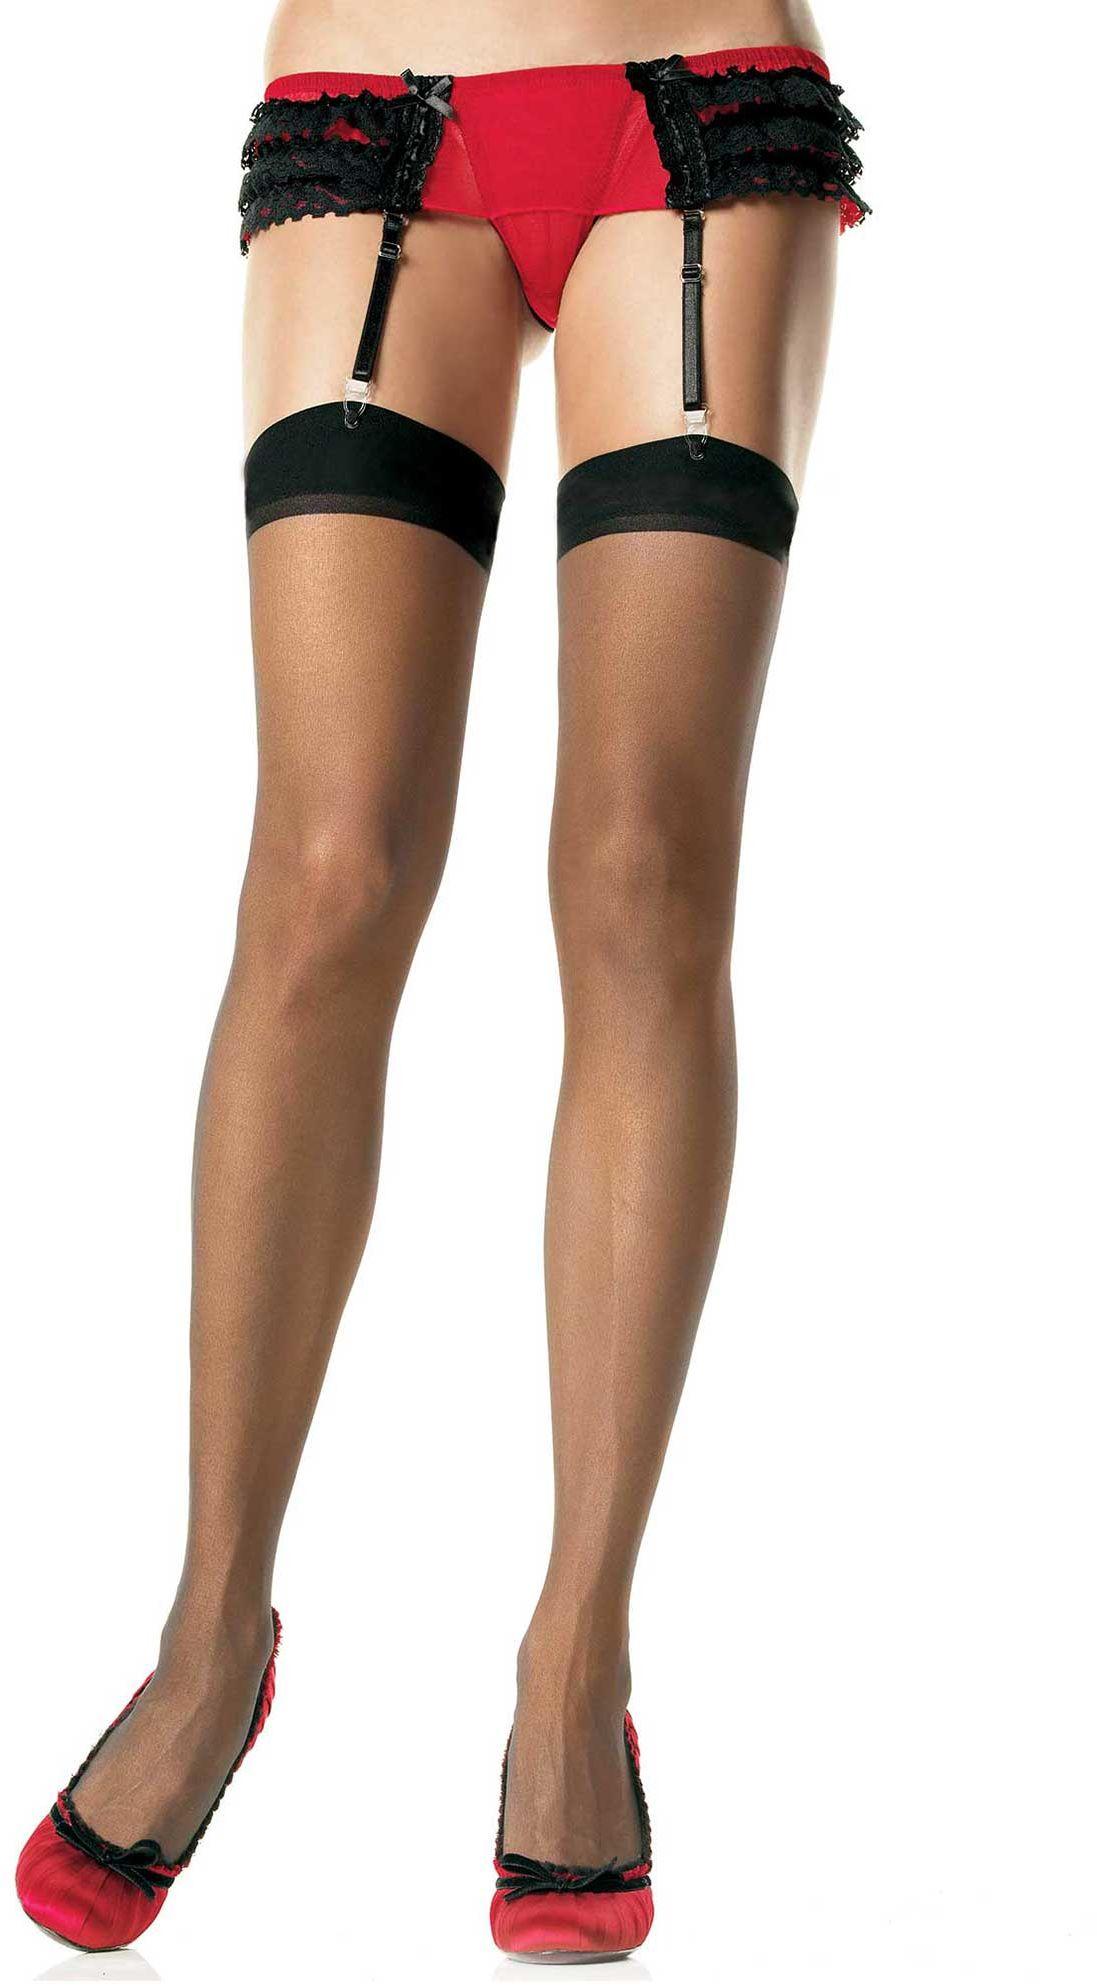 Leg Avenue Sheer Stockings 1001 Black